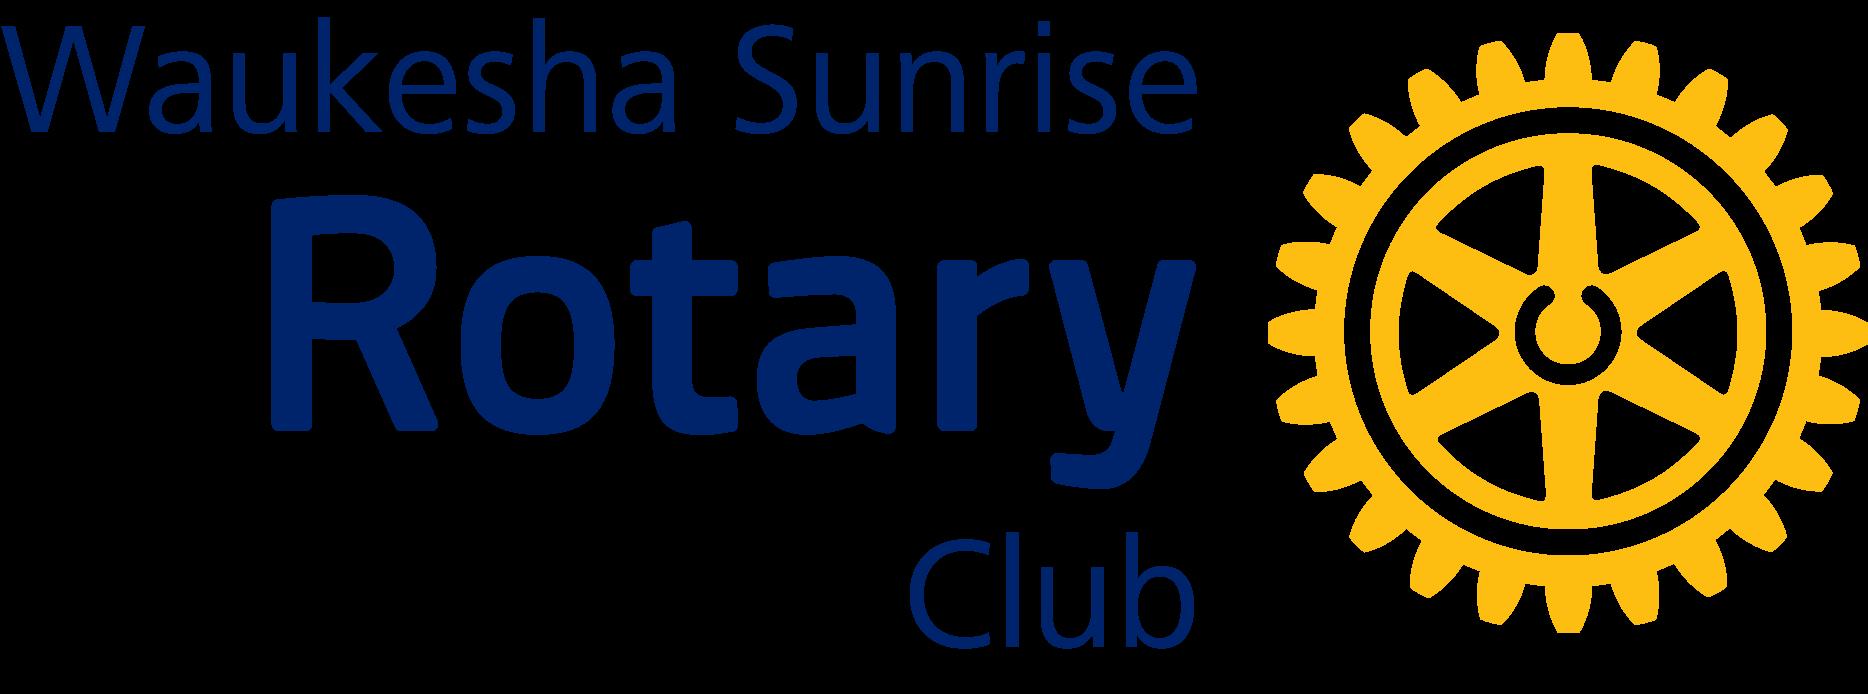 Waukesha Sunrise logo